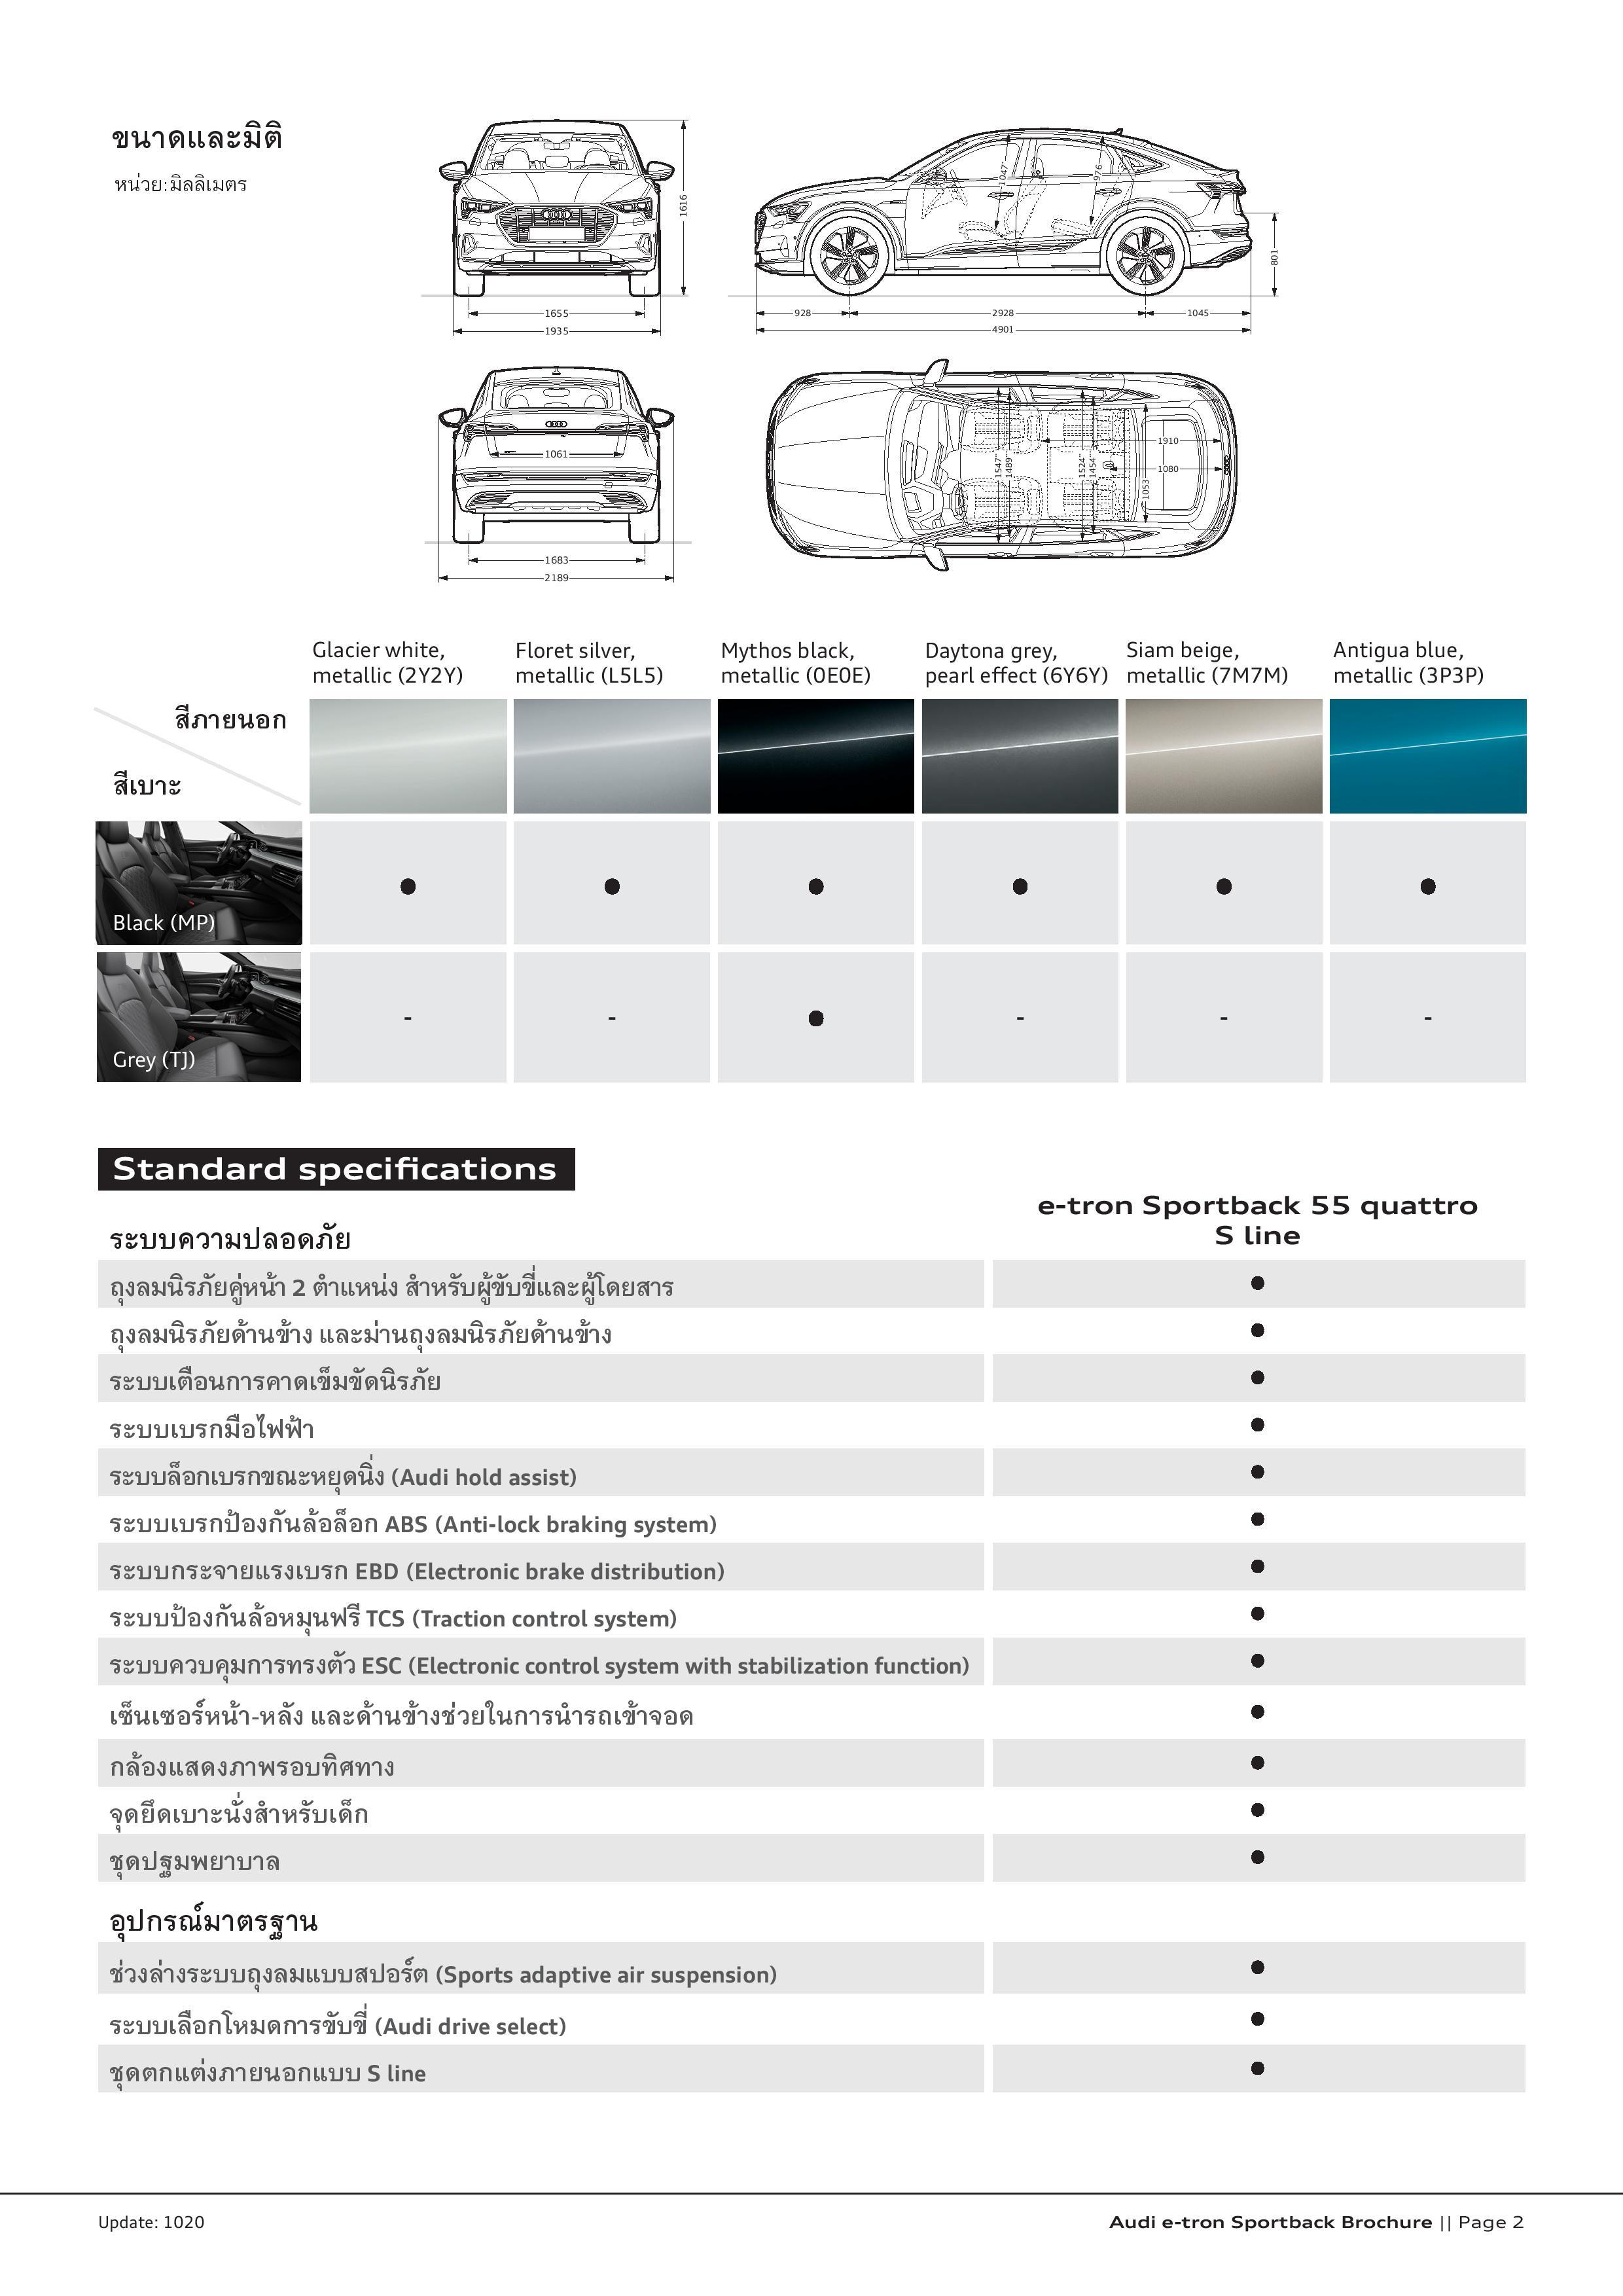 e-tron_Sportback_WebBrochure_Oct2020-page-002